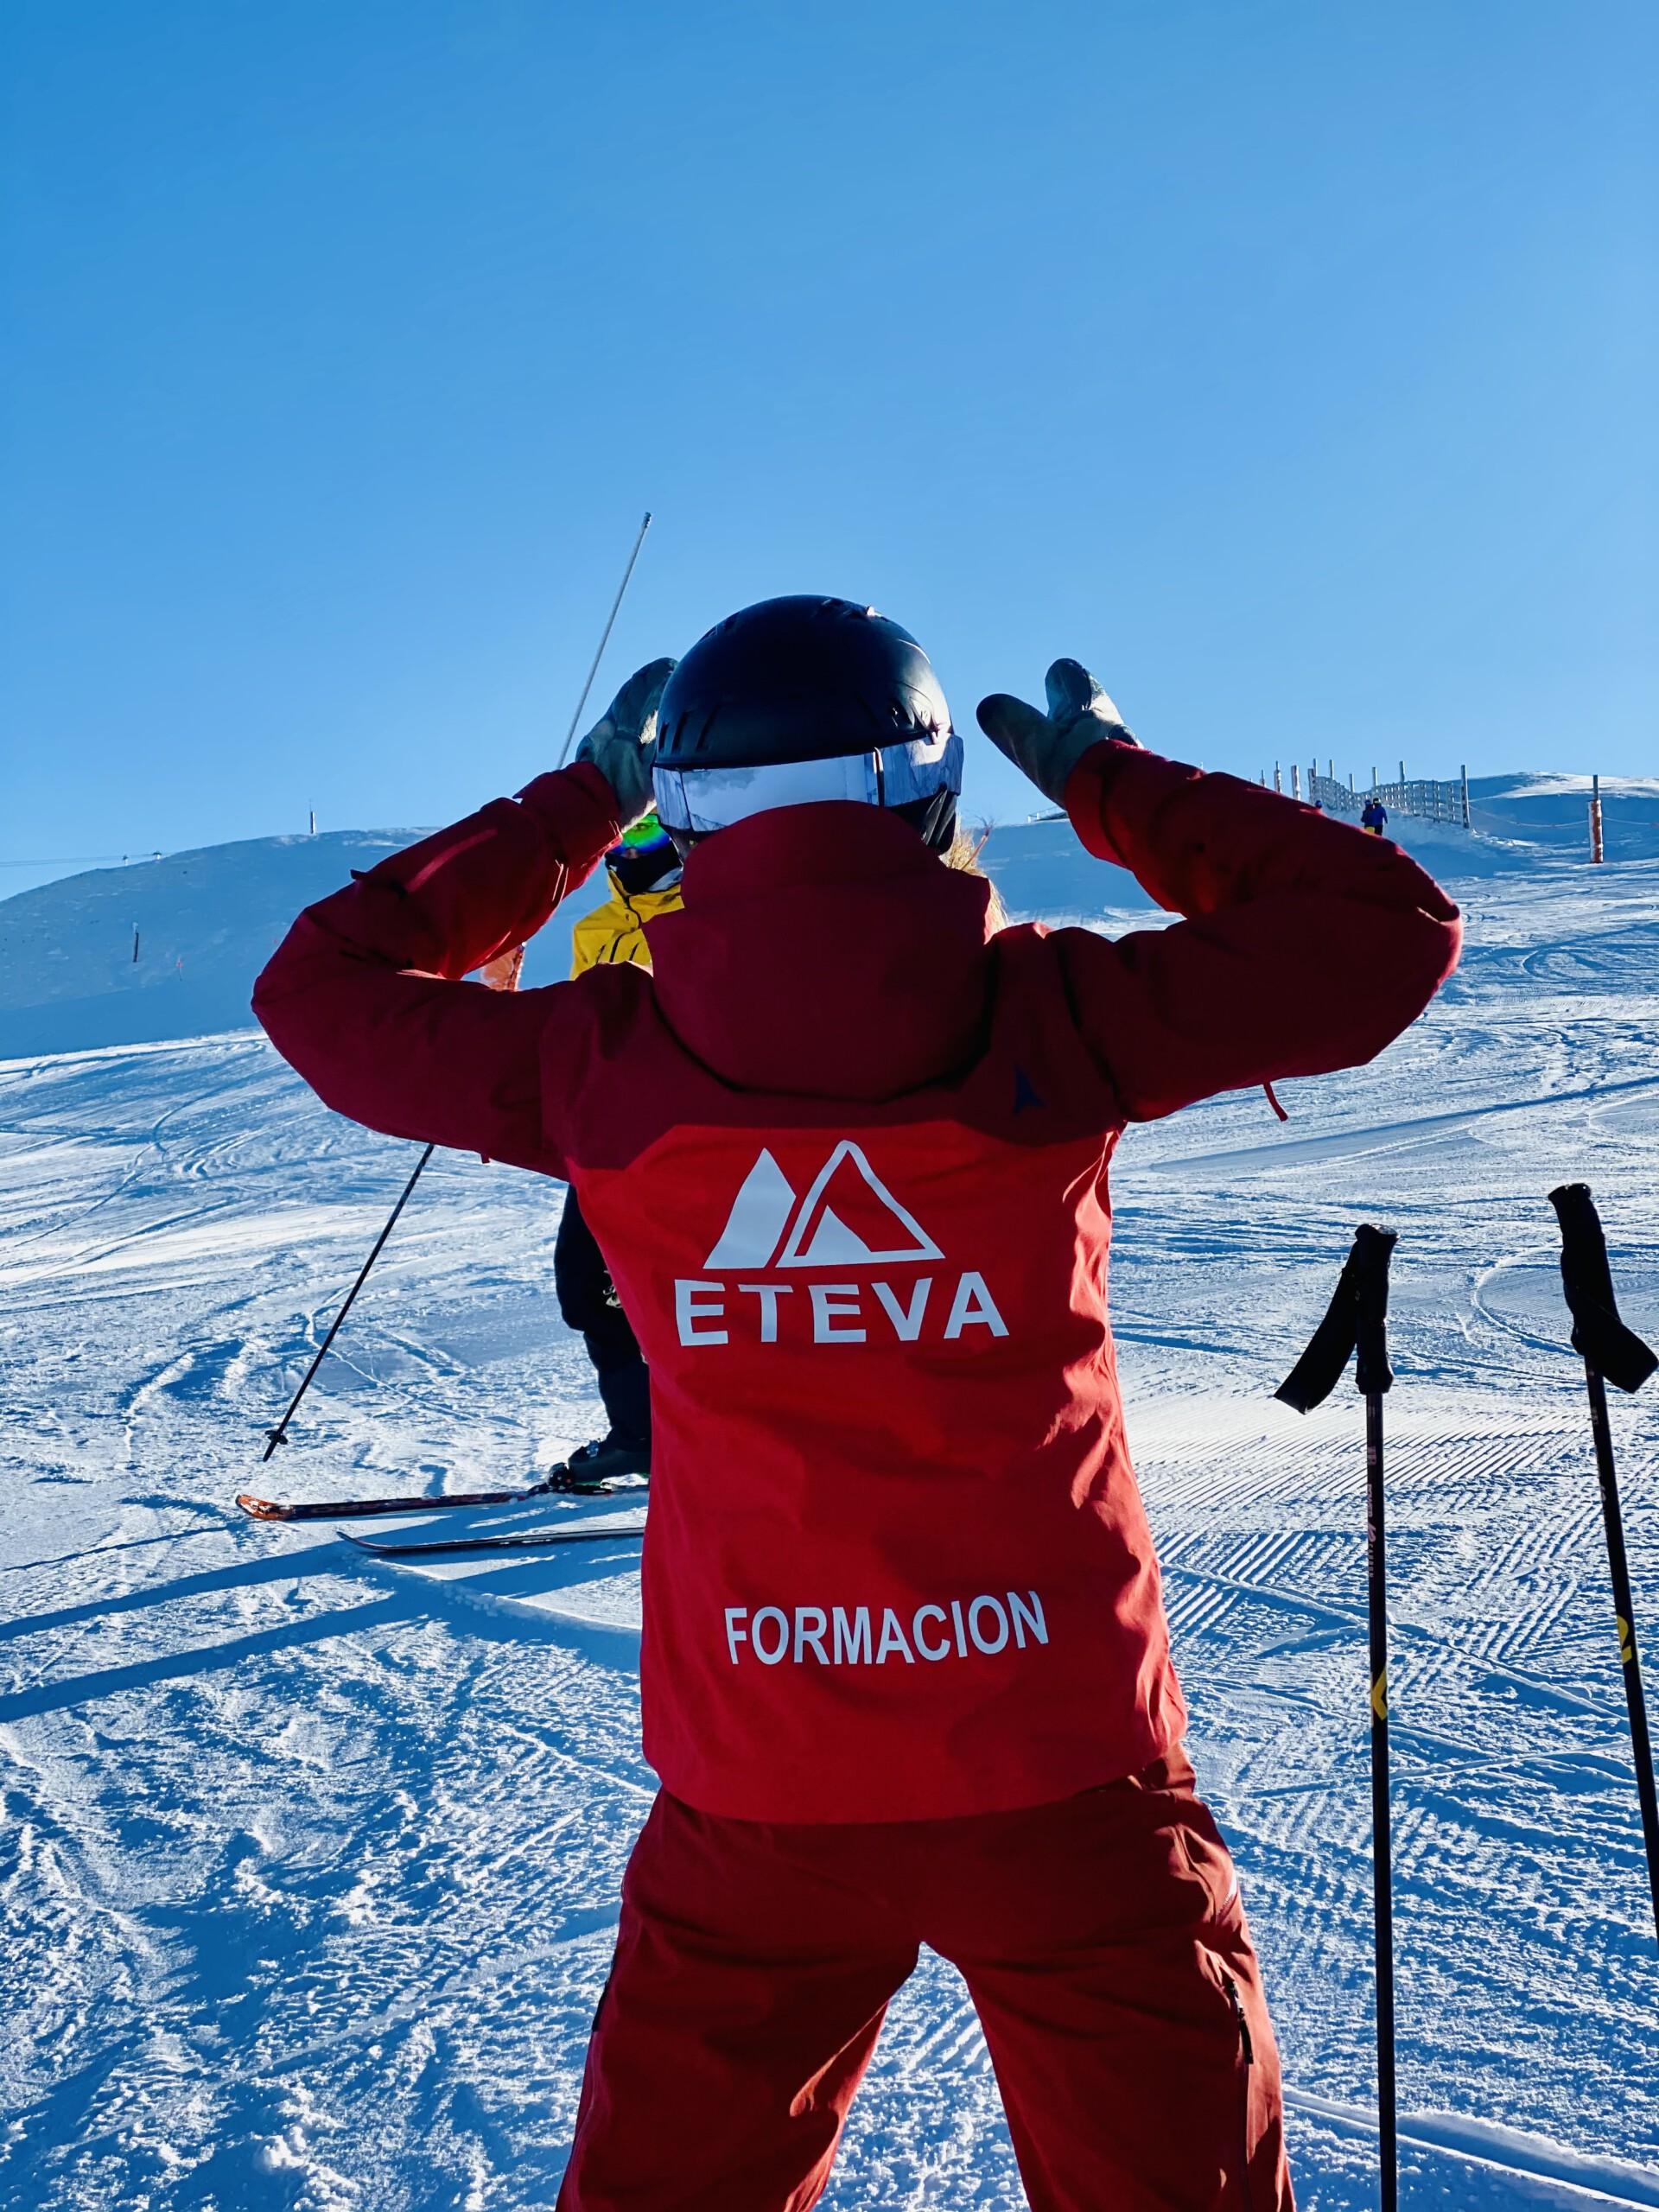 cursos esqui alpino baqueira beret